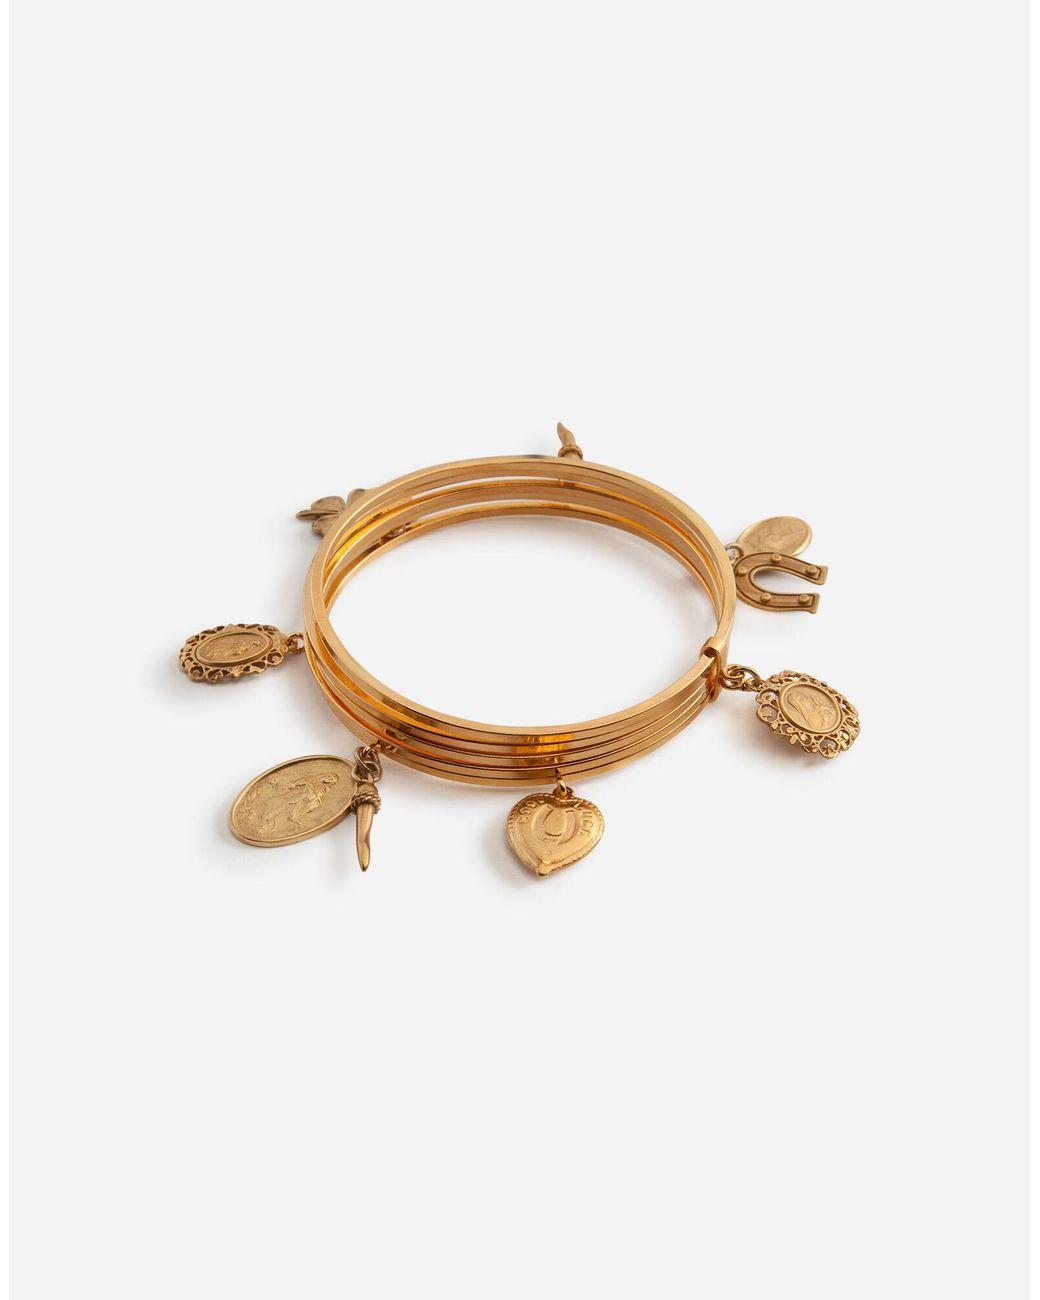 L NEW $250 DOLCE /& GABBANA Bracelet Ball Beaded Brown Pull Strap Gold Band s